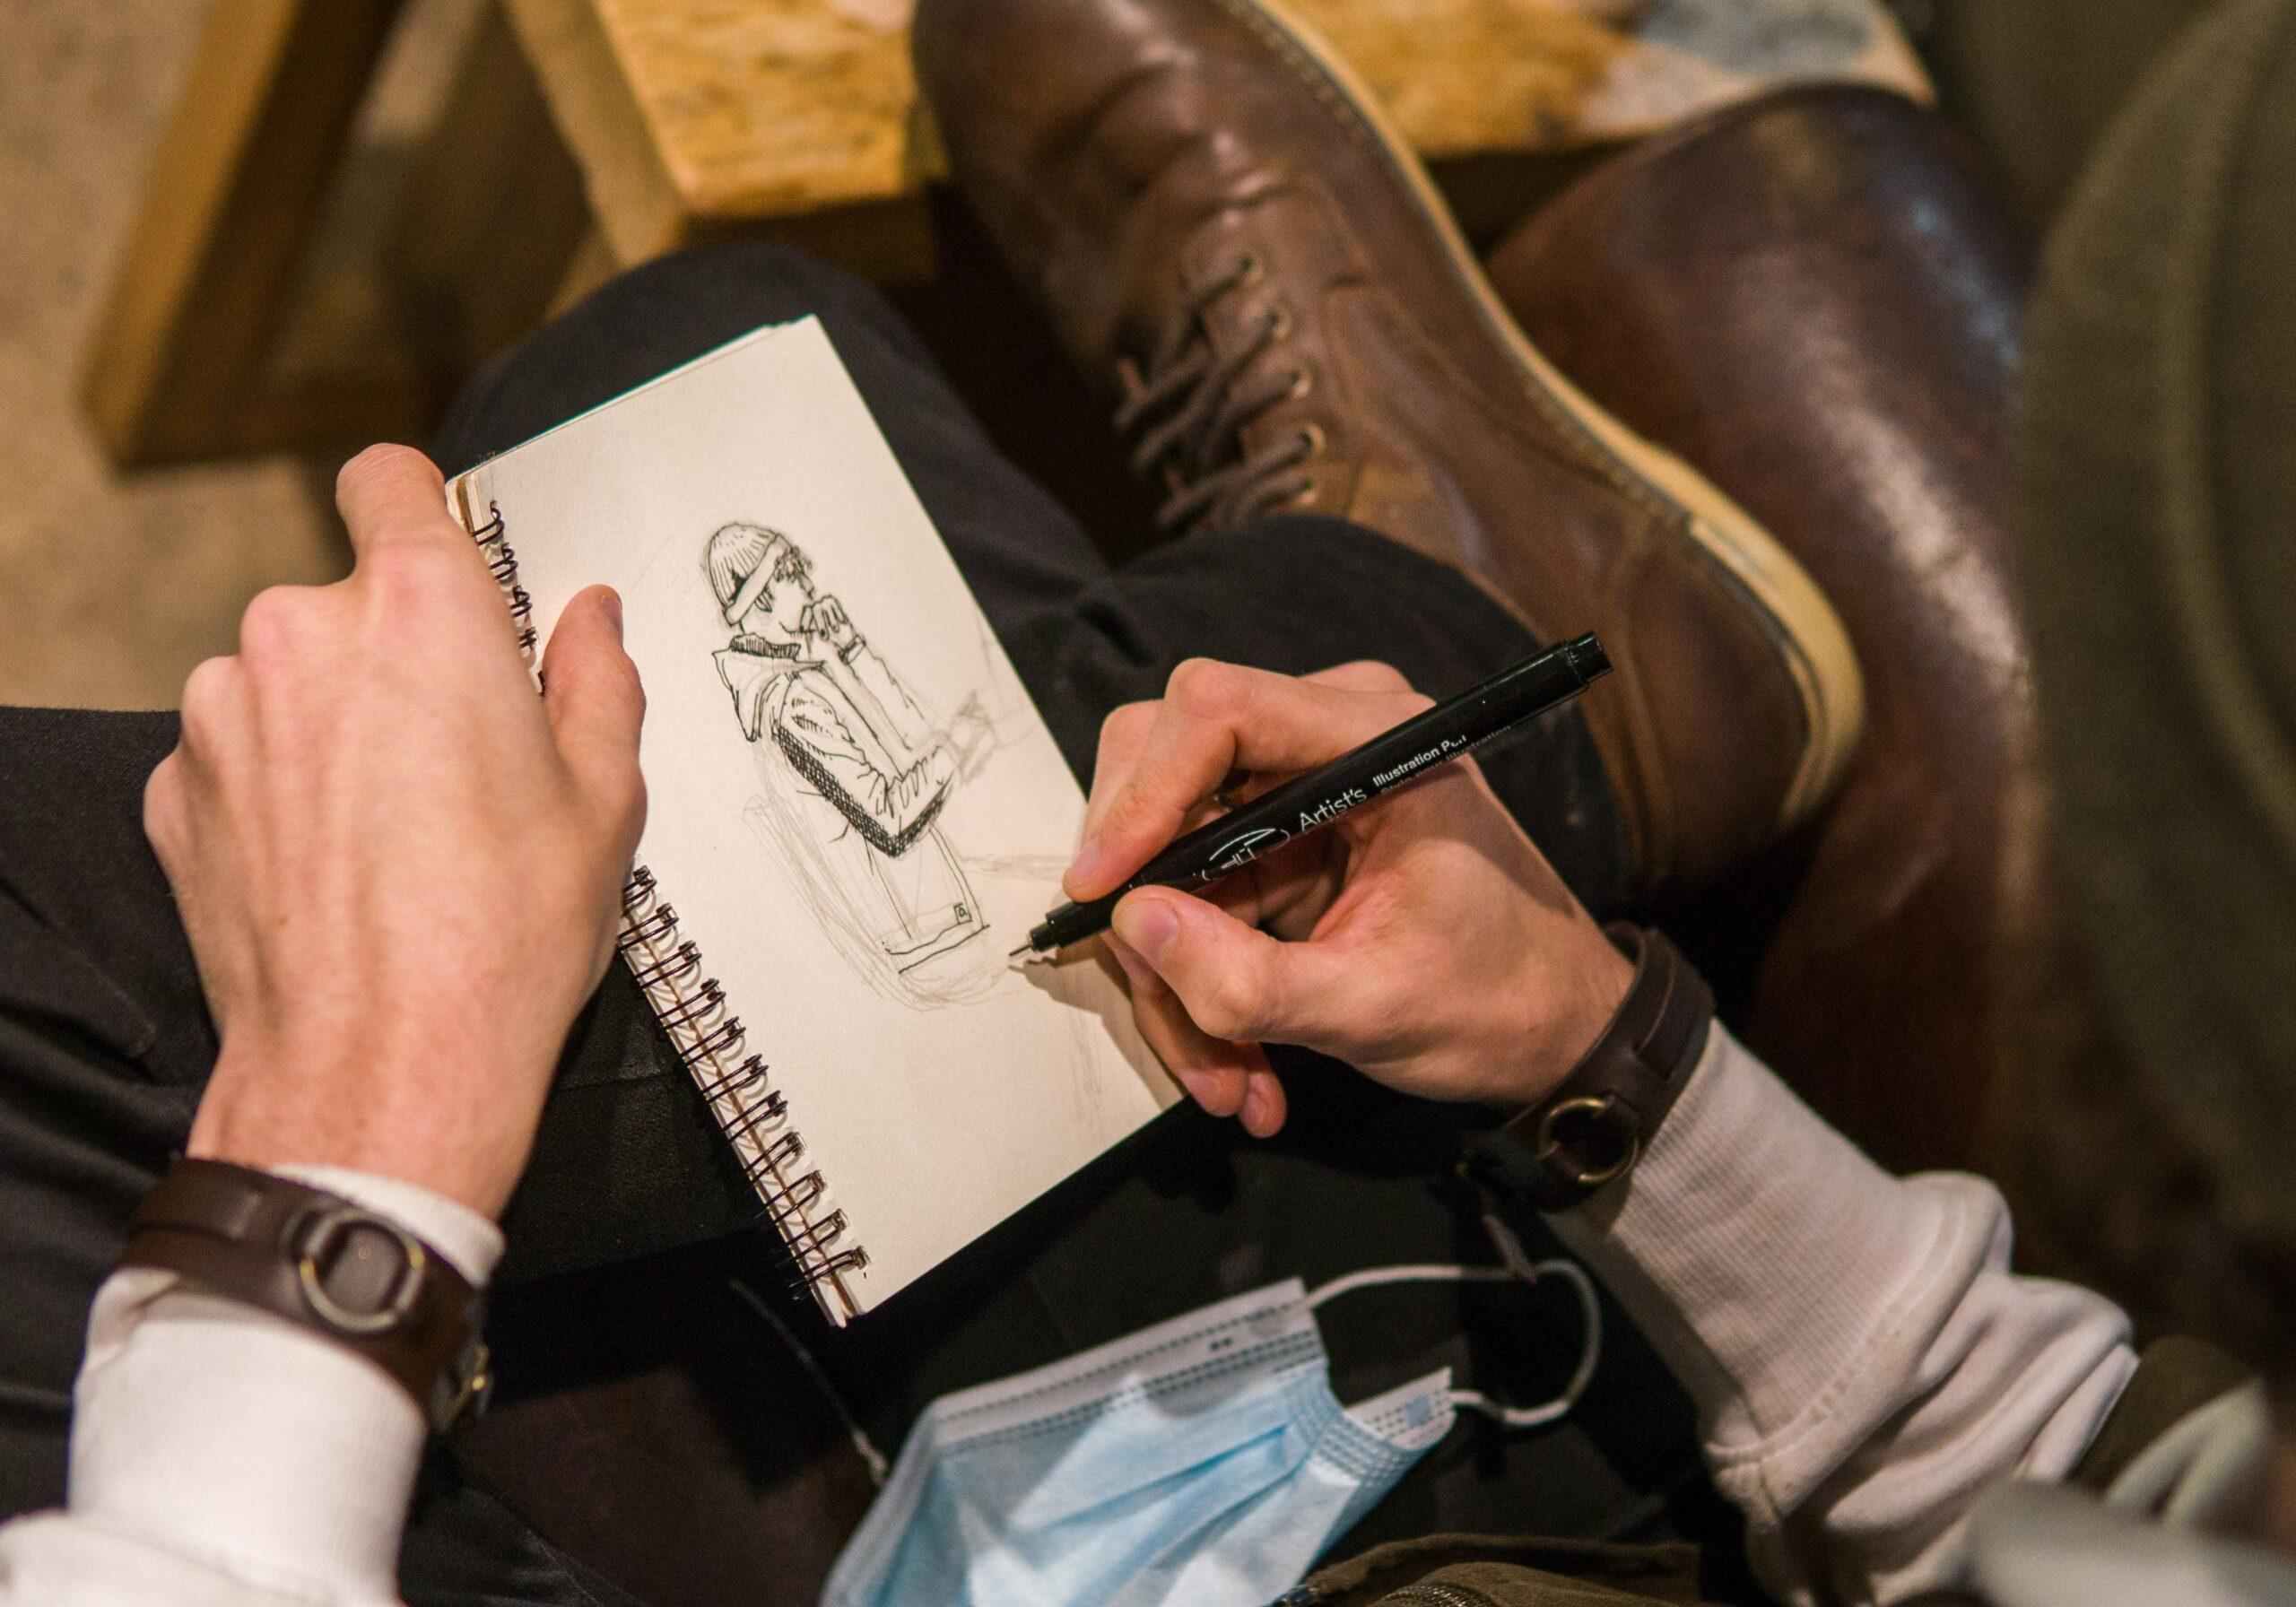 Max Macaulay is a Halifax-based artist who has had videos of his artwork go viral recently, garnering an impressive 220K followers on his TikTok @slick.skills. (Photo by Geoffrey Howard)